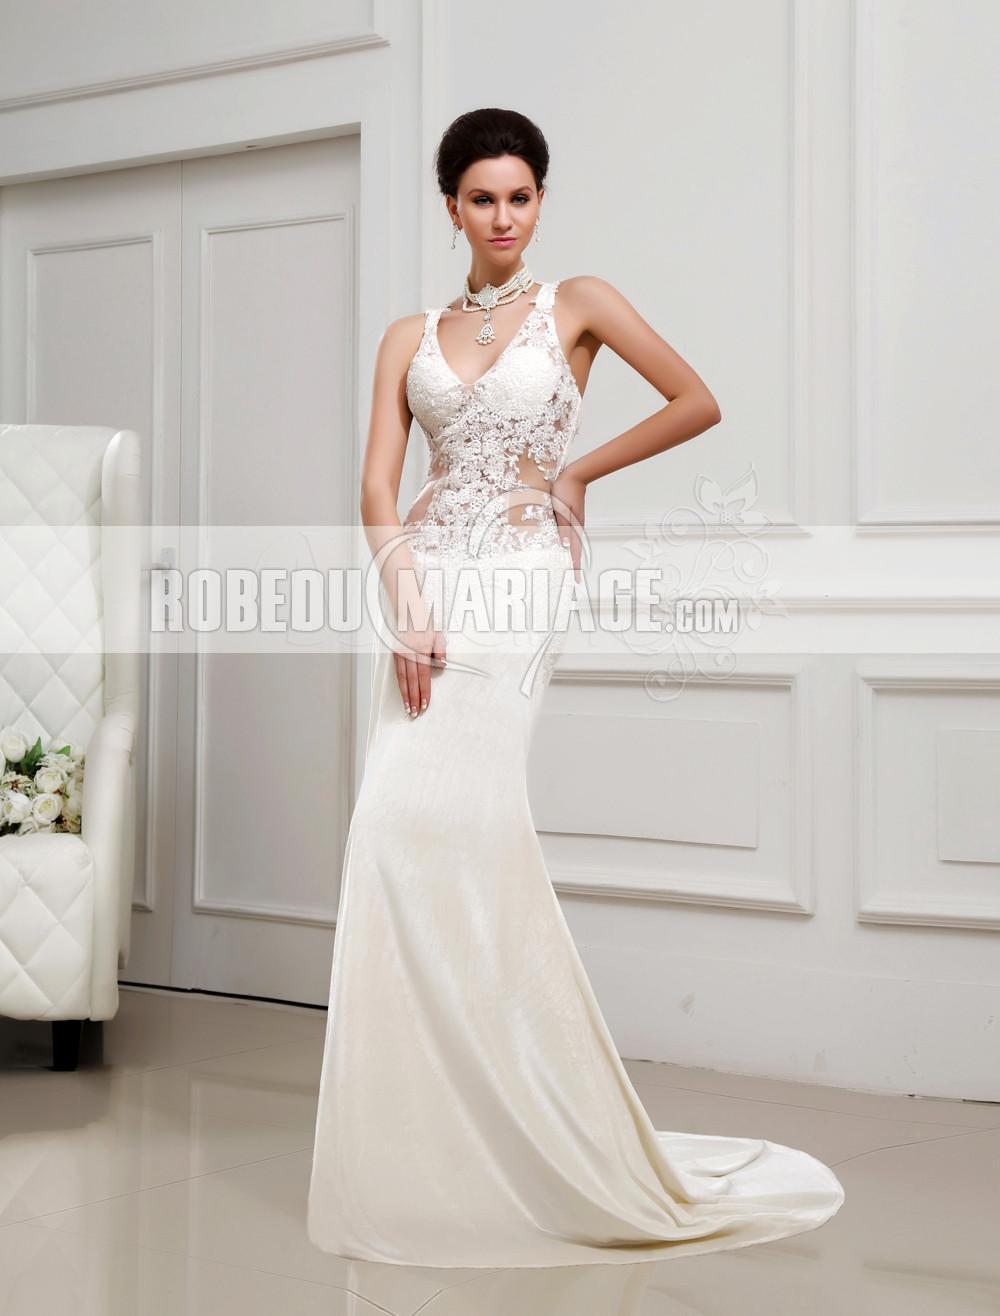 dentelle robe de mariage col en v taffetas pas cher chiffon empire robe206932. Black Bedroom Furniture Sets. Home Design Ideas